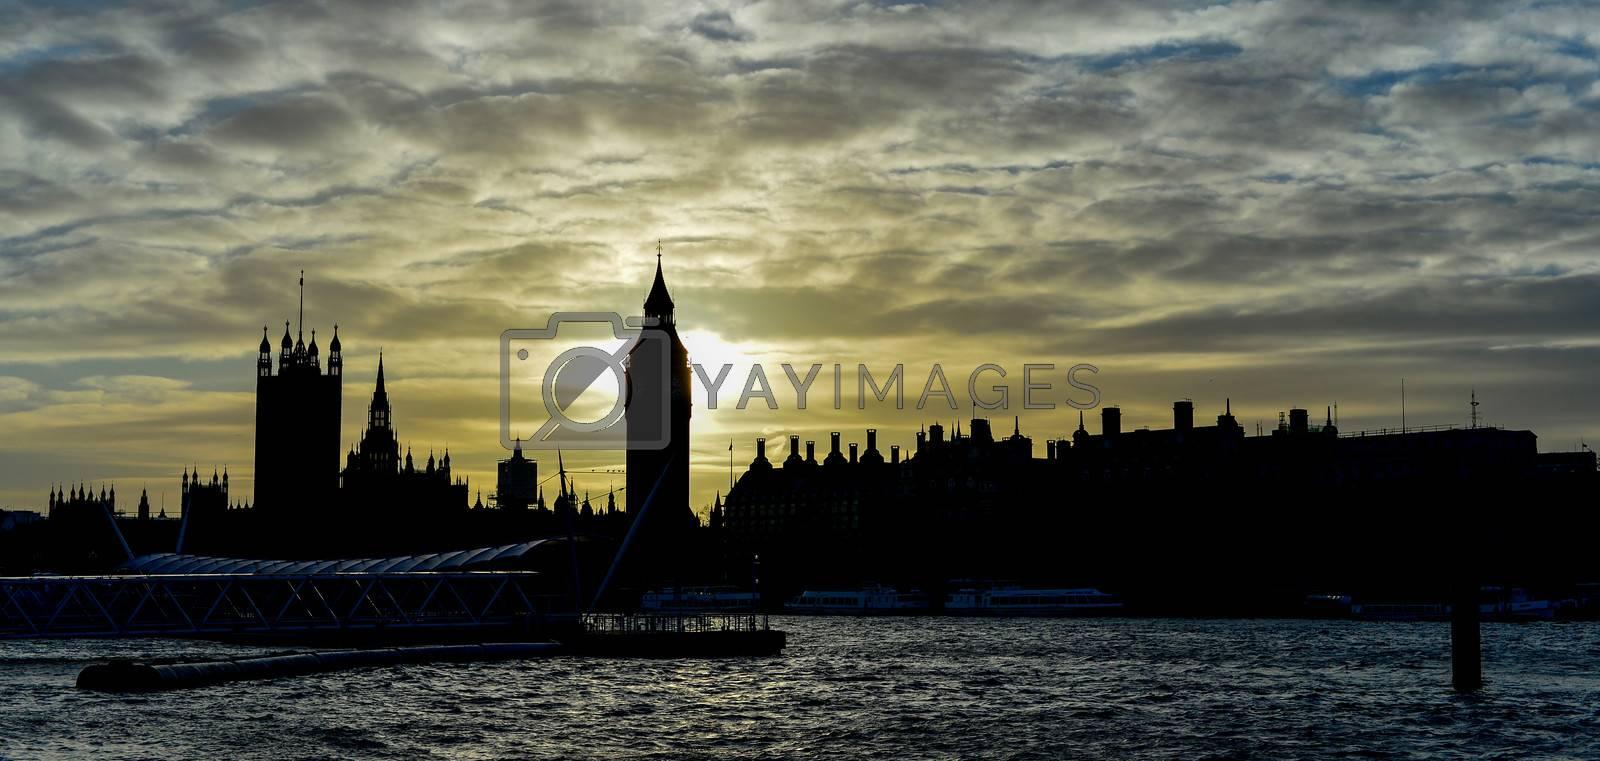 Sunset view of famous Big Ben, cloudy sky